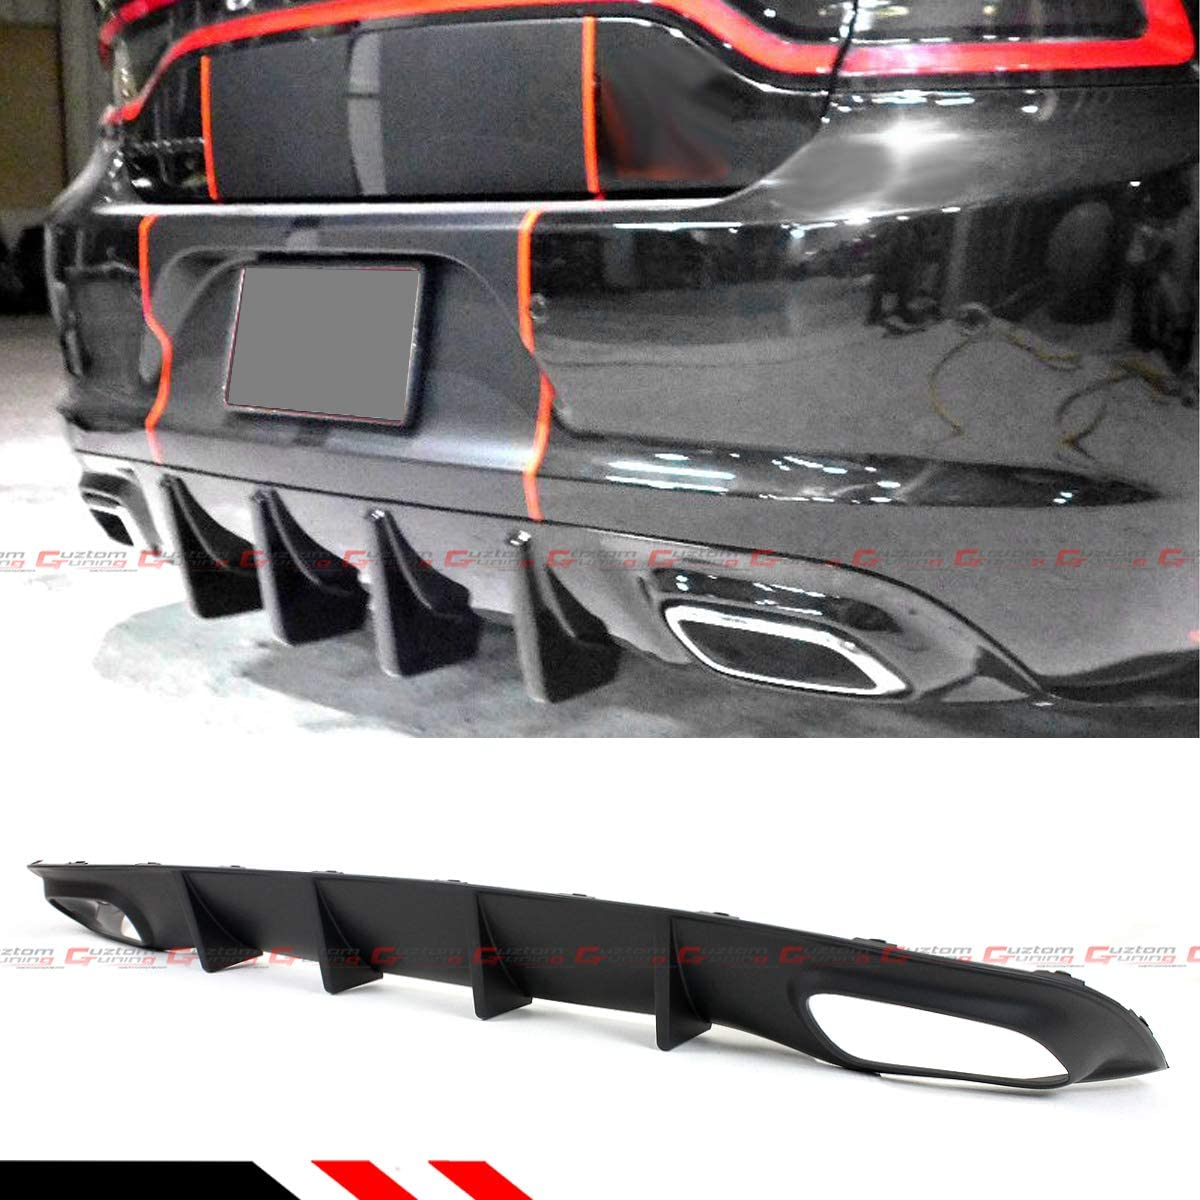 For 2015-2019 Dodge Charger SXT SE Shark Fin Rear Bumper Diffuser Valance Lip-Matt Black